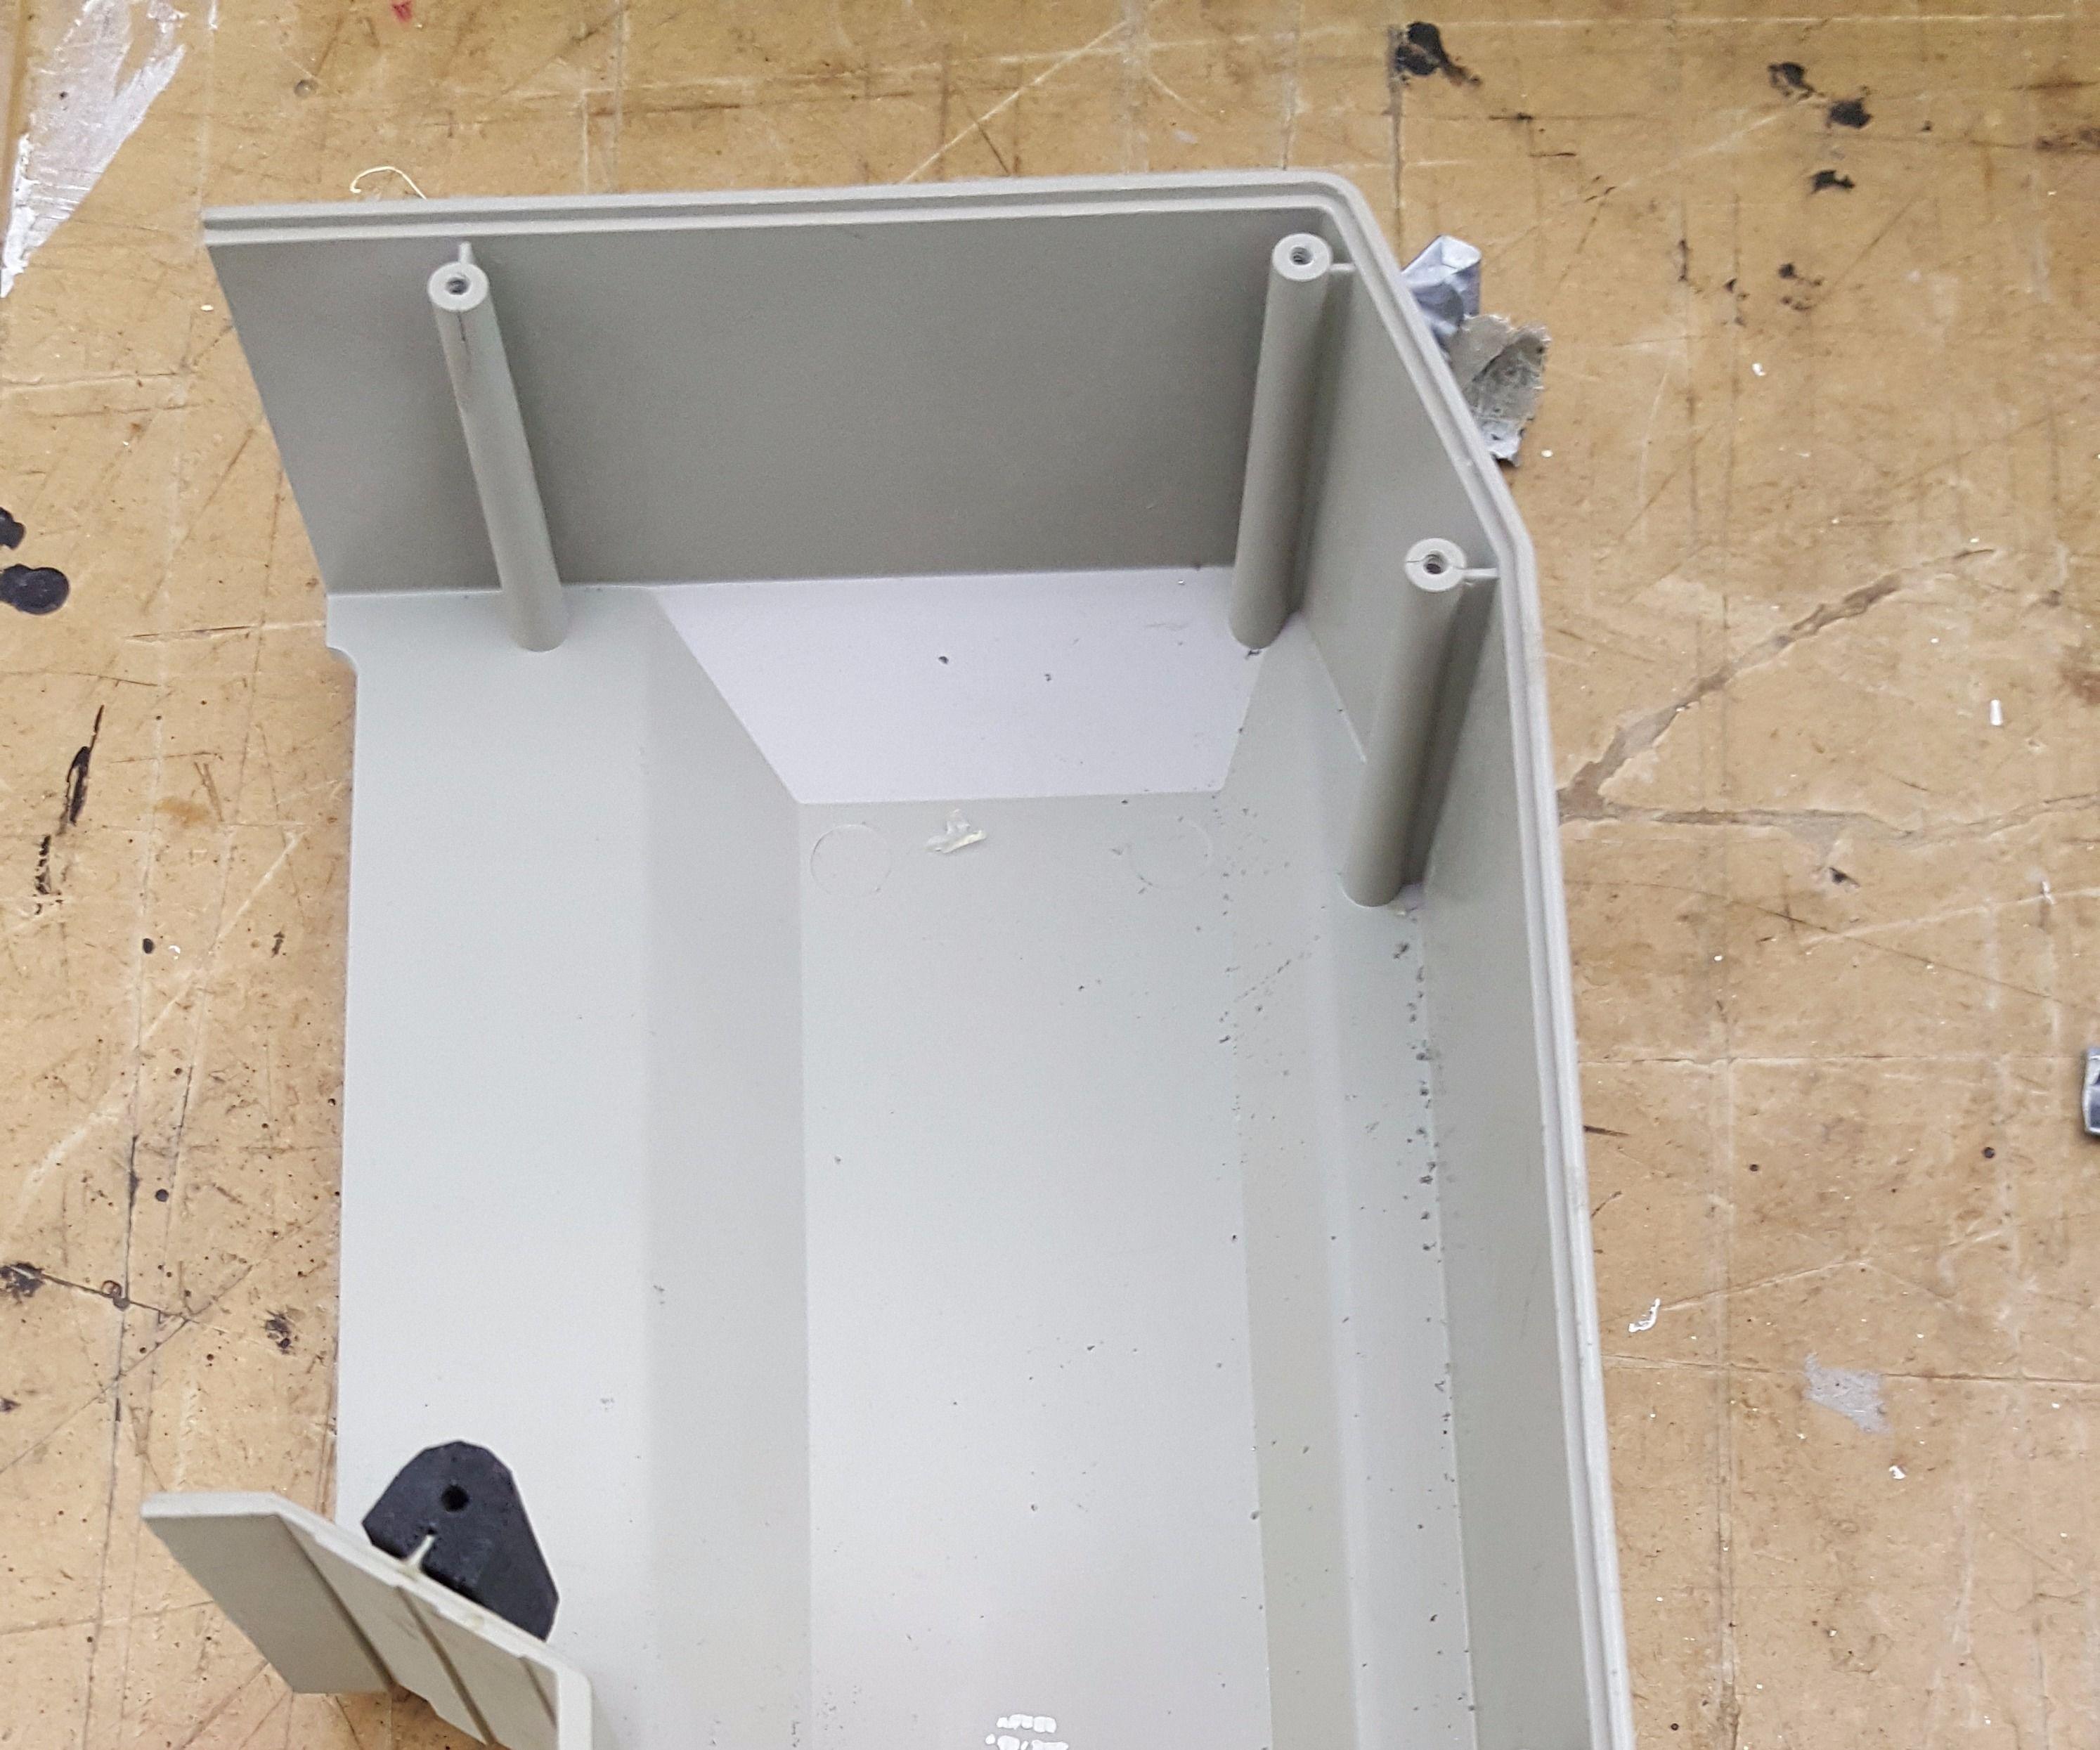 3D Printed Insert to Repair Boss. Made in Techshop Detroit